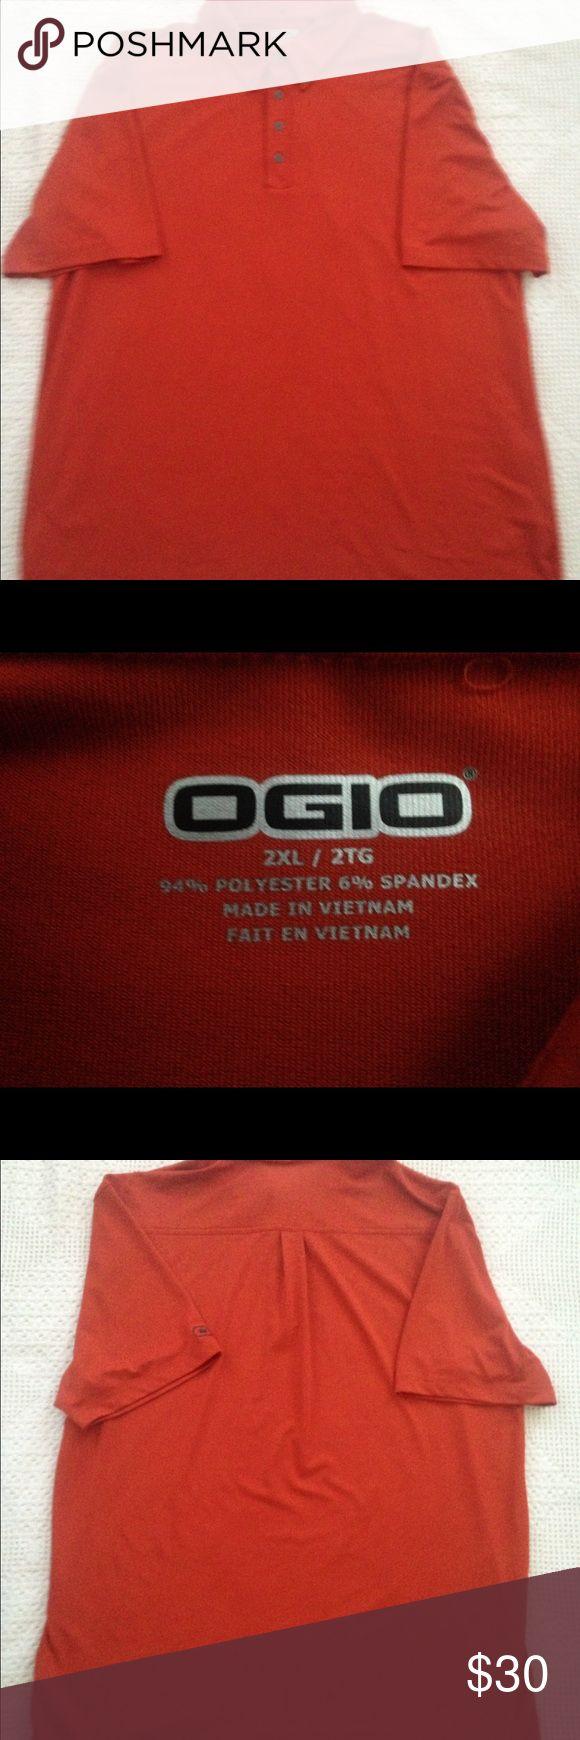 Men's XXL OGIO golf polo shirt Men's OGIO golf polo shirt OGIO Shirts Polos